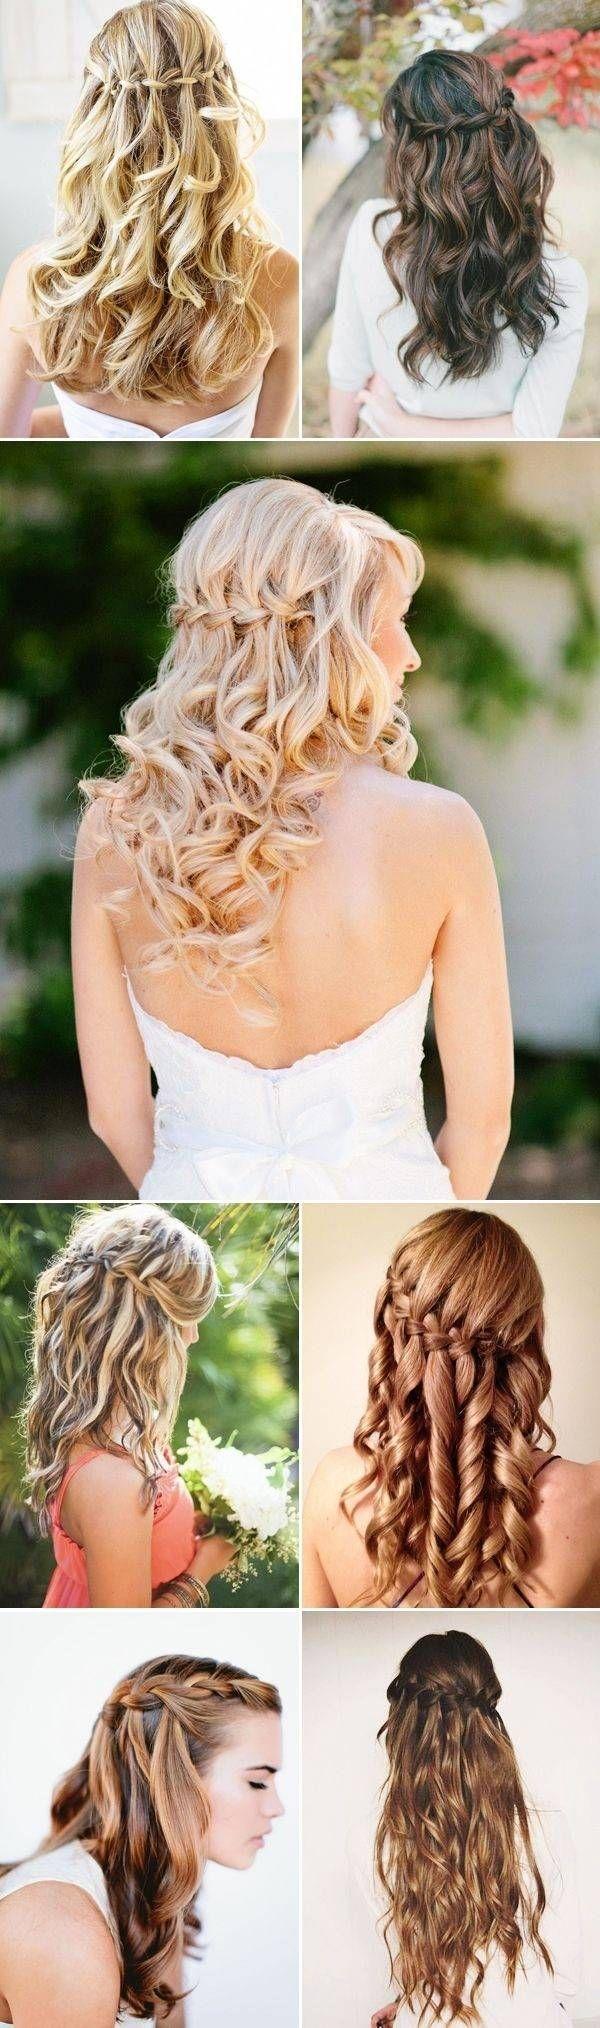 Bridesmaid Long Curly Hairstyles